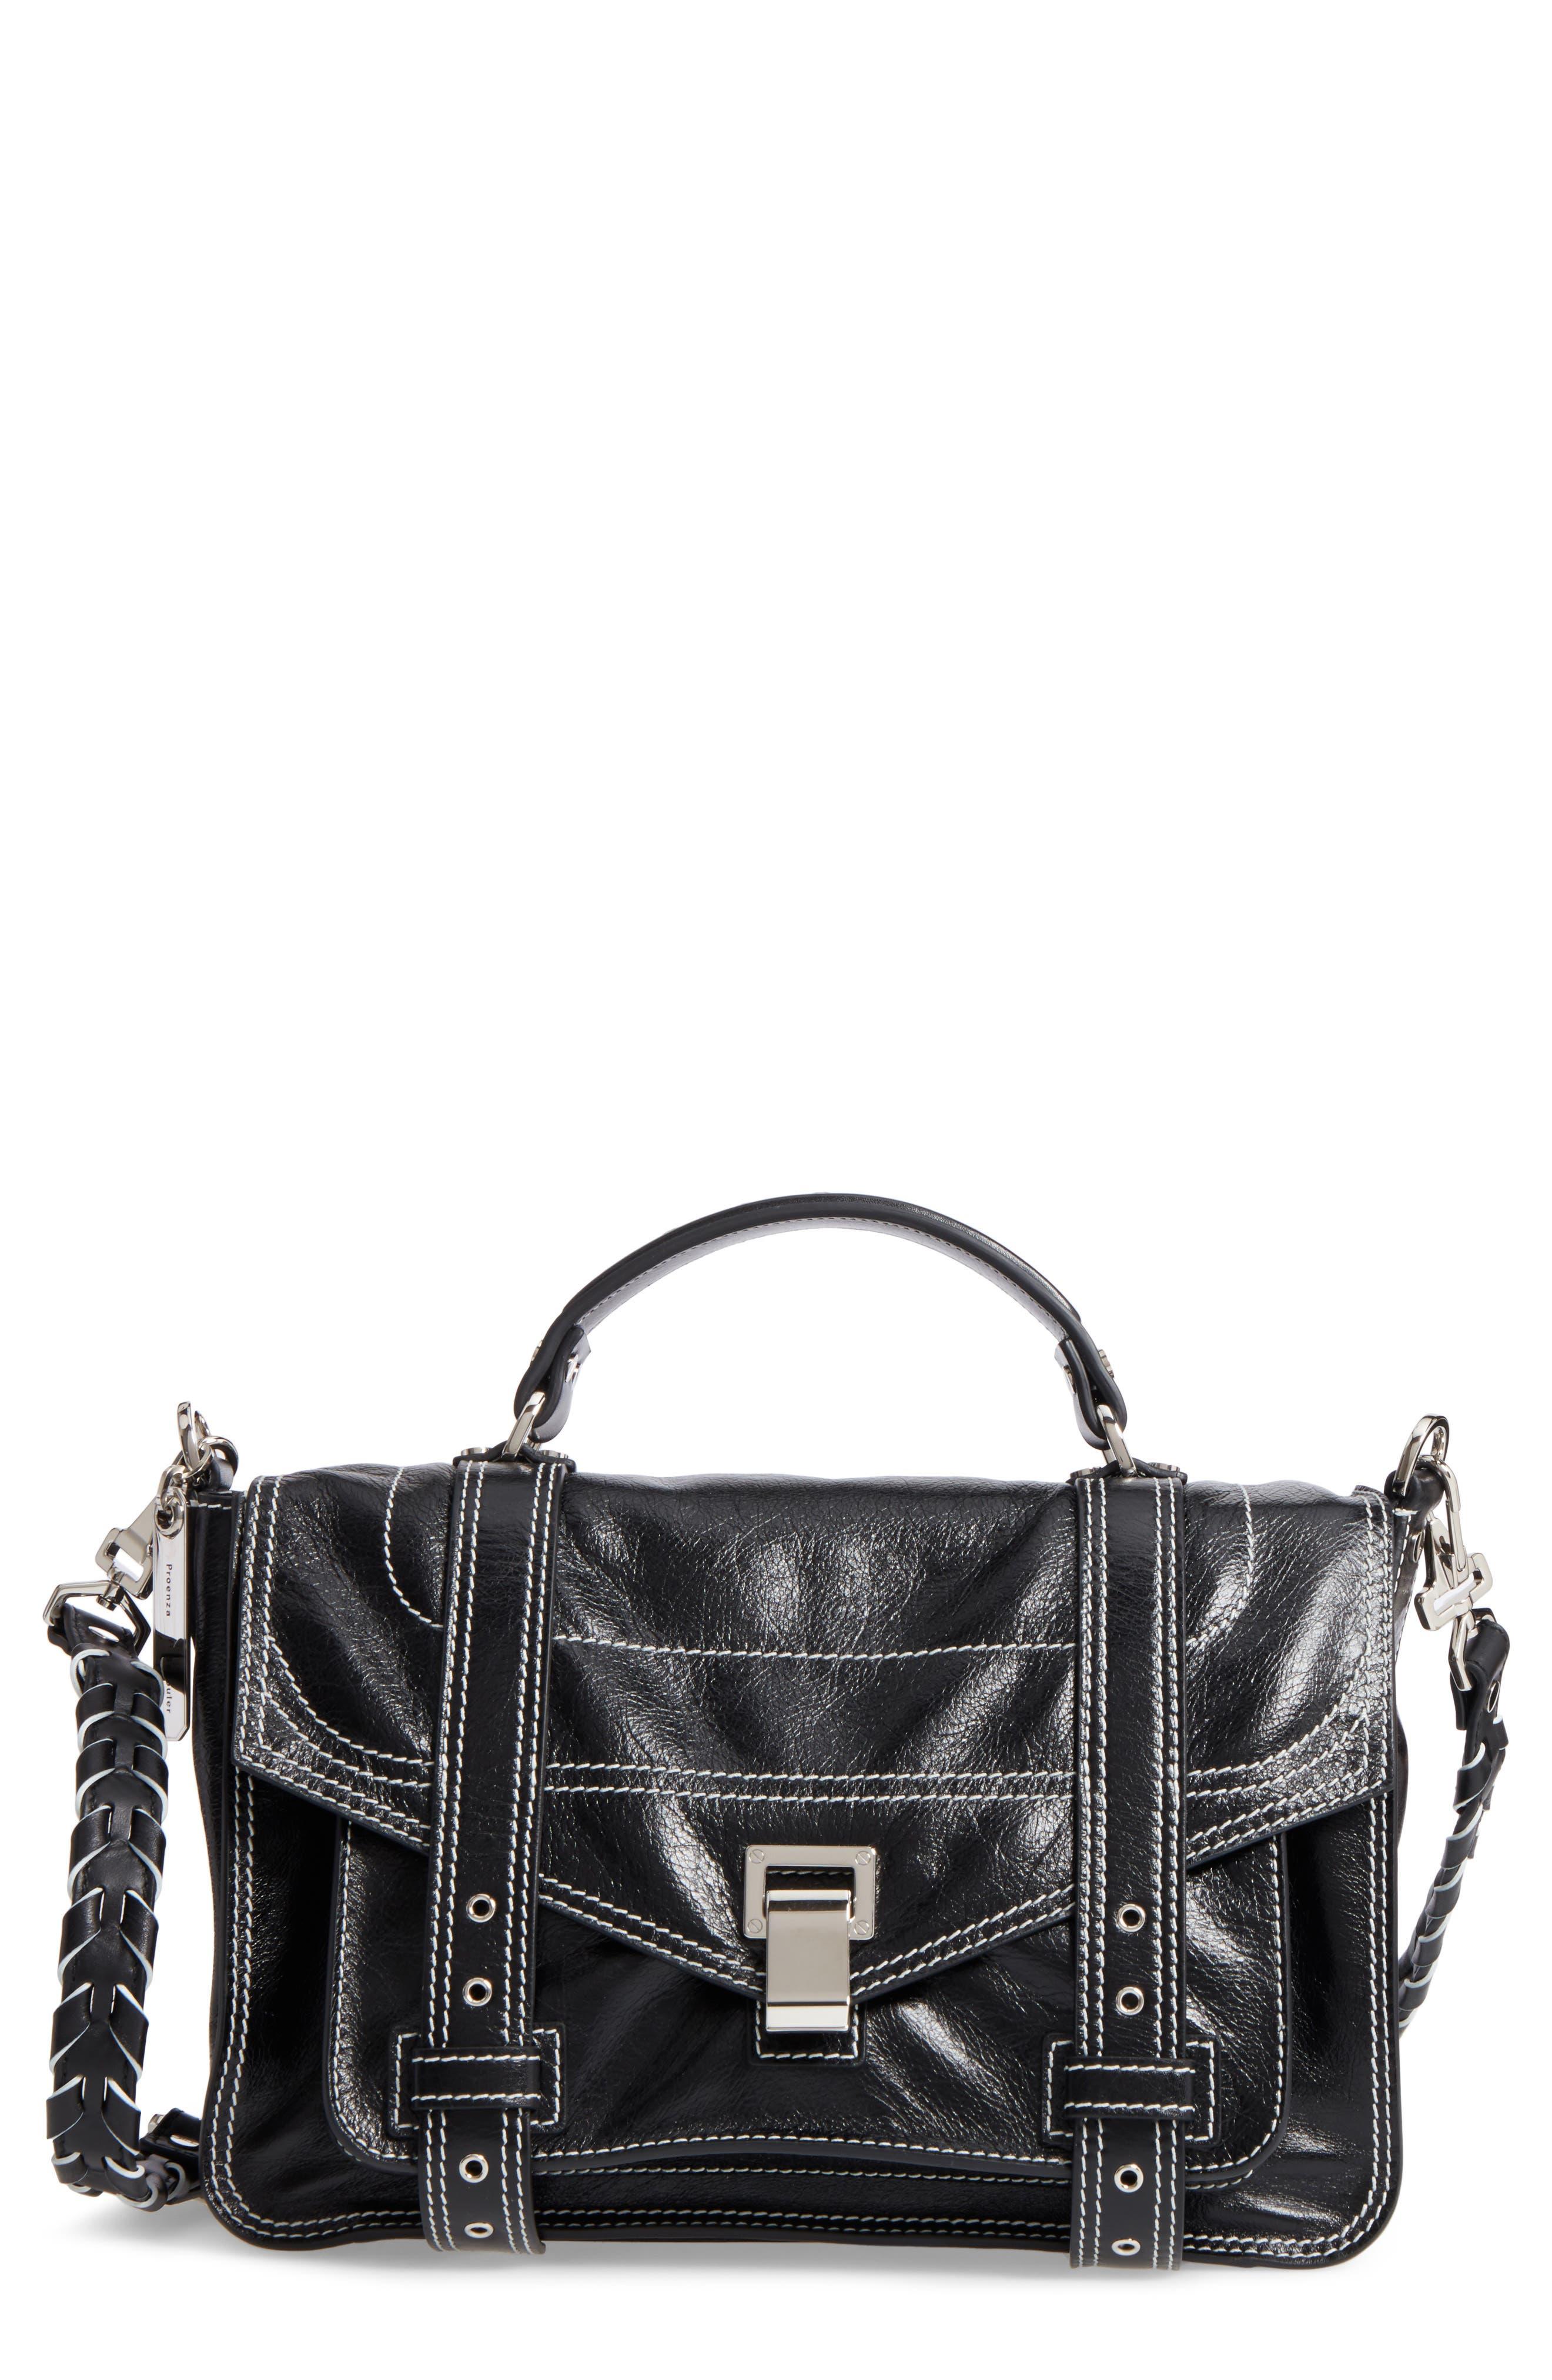 Main Image - Proenza Schouler Medium PS1 Calfskin Leather Satchel